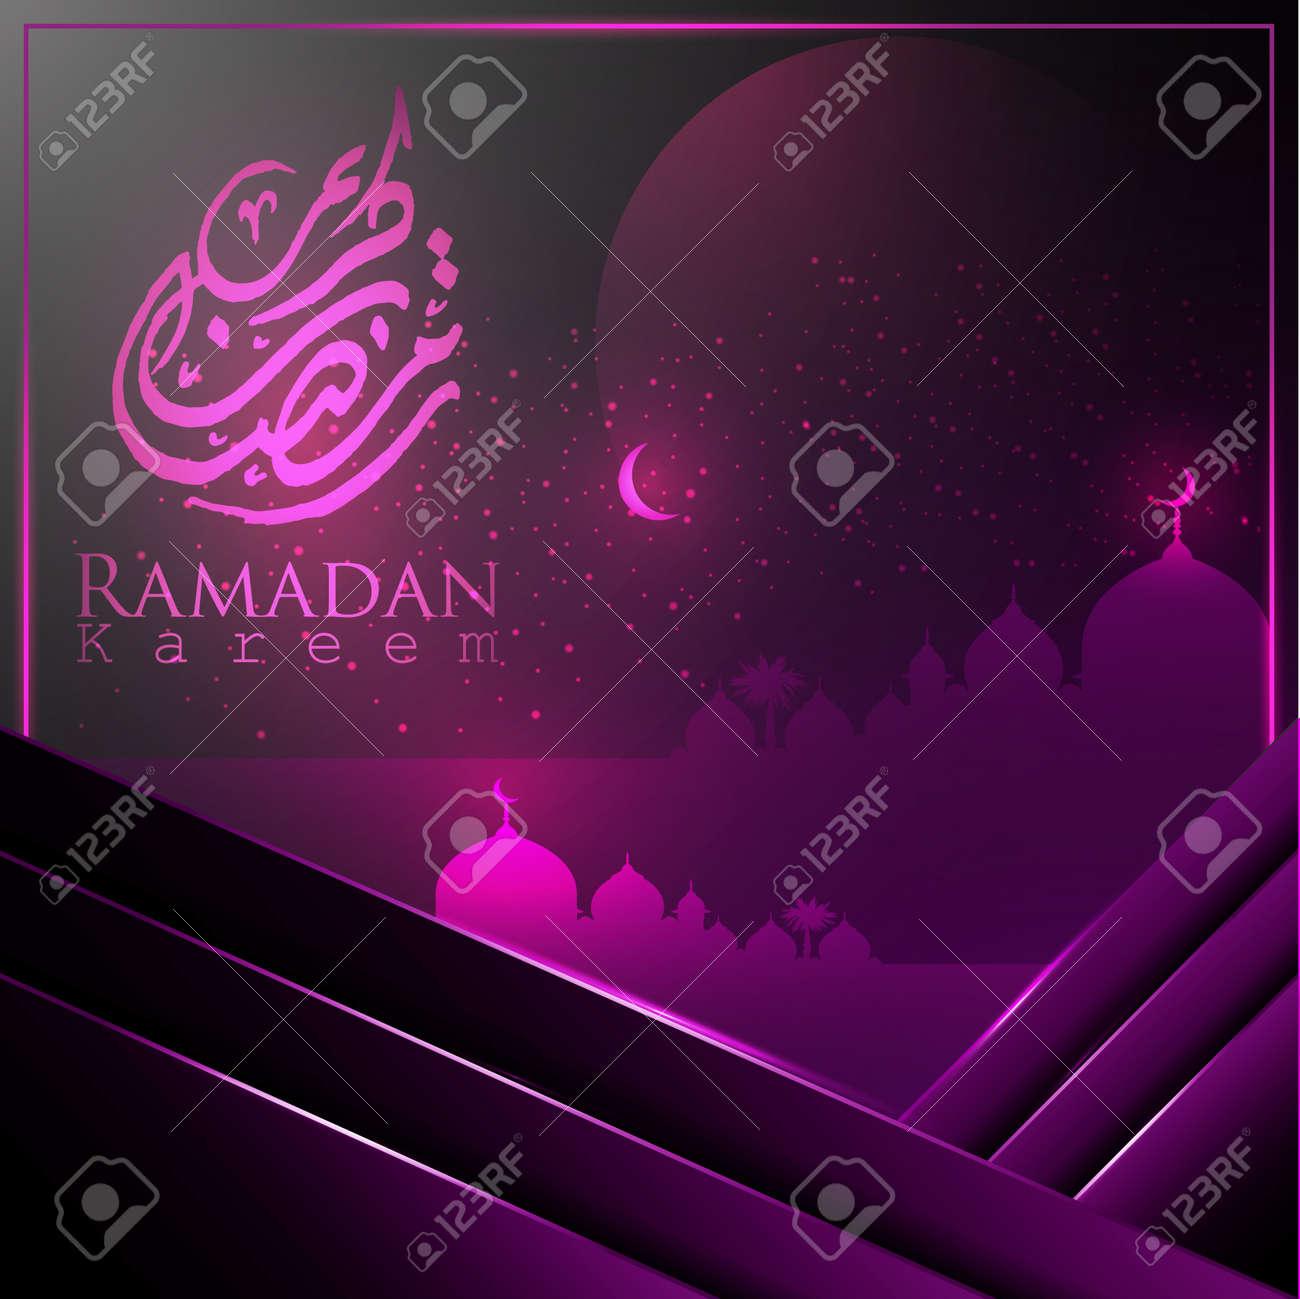 Ramadan Kareem islamic greeting card template withislamic calligraphy,